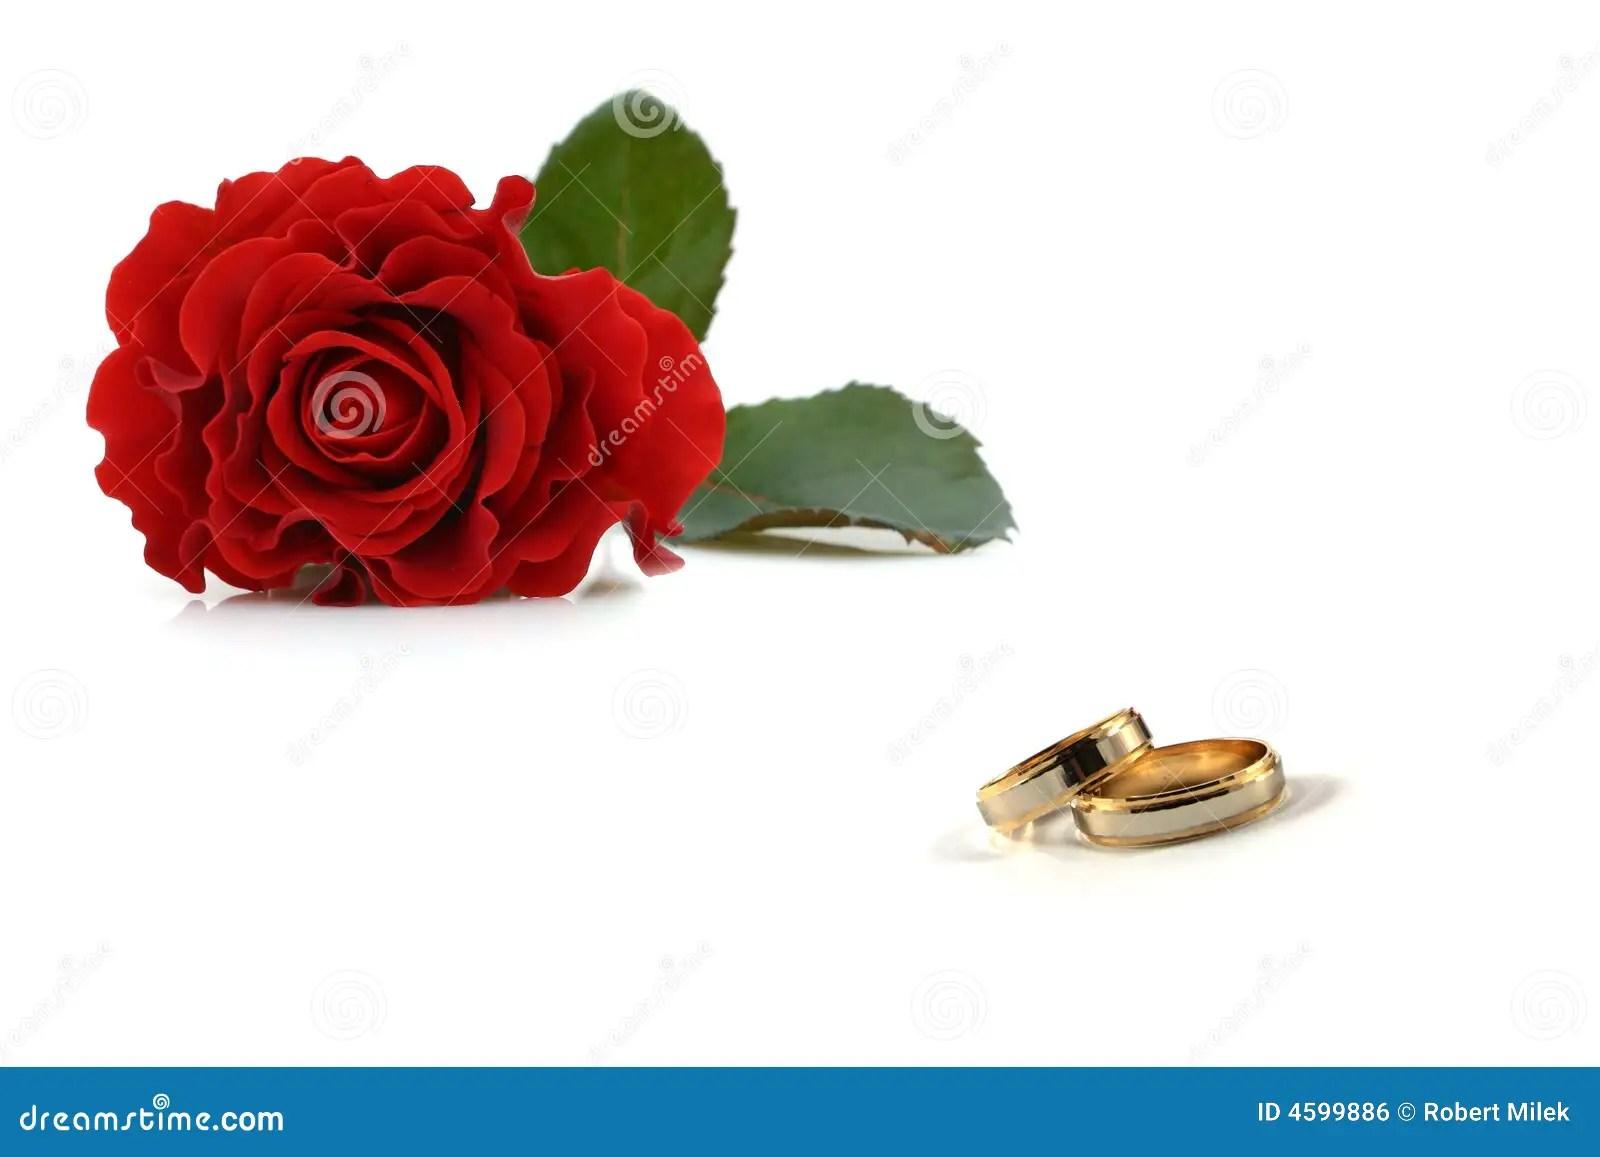 royalty free stock image wedding rings roses image rose wedding ring Wedding rings and roses